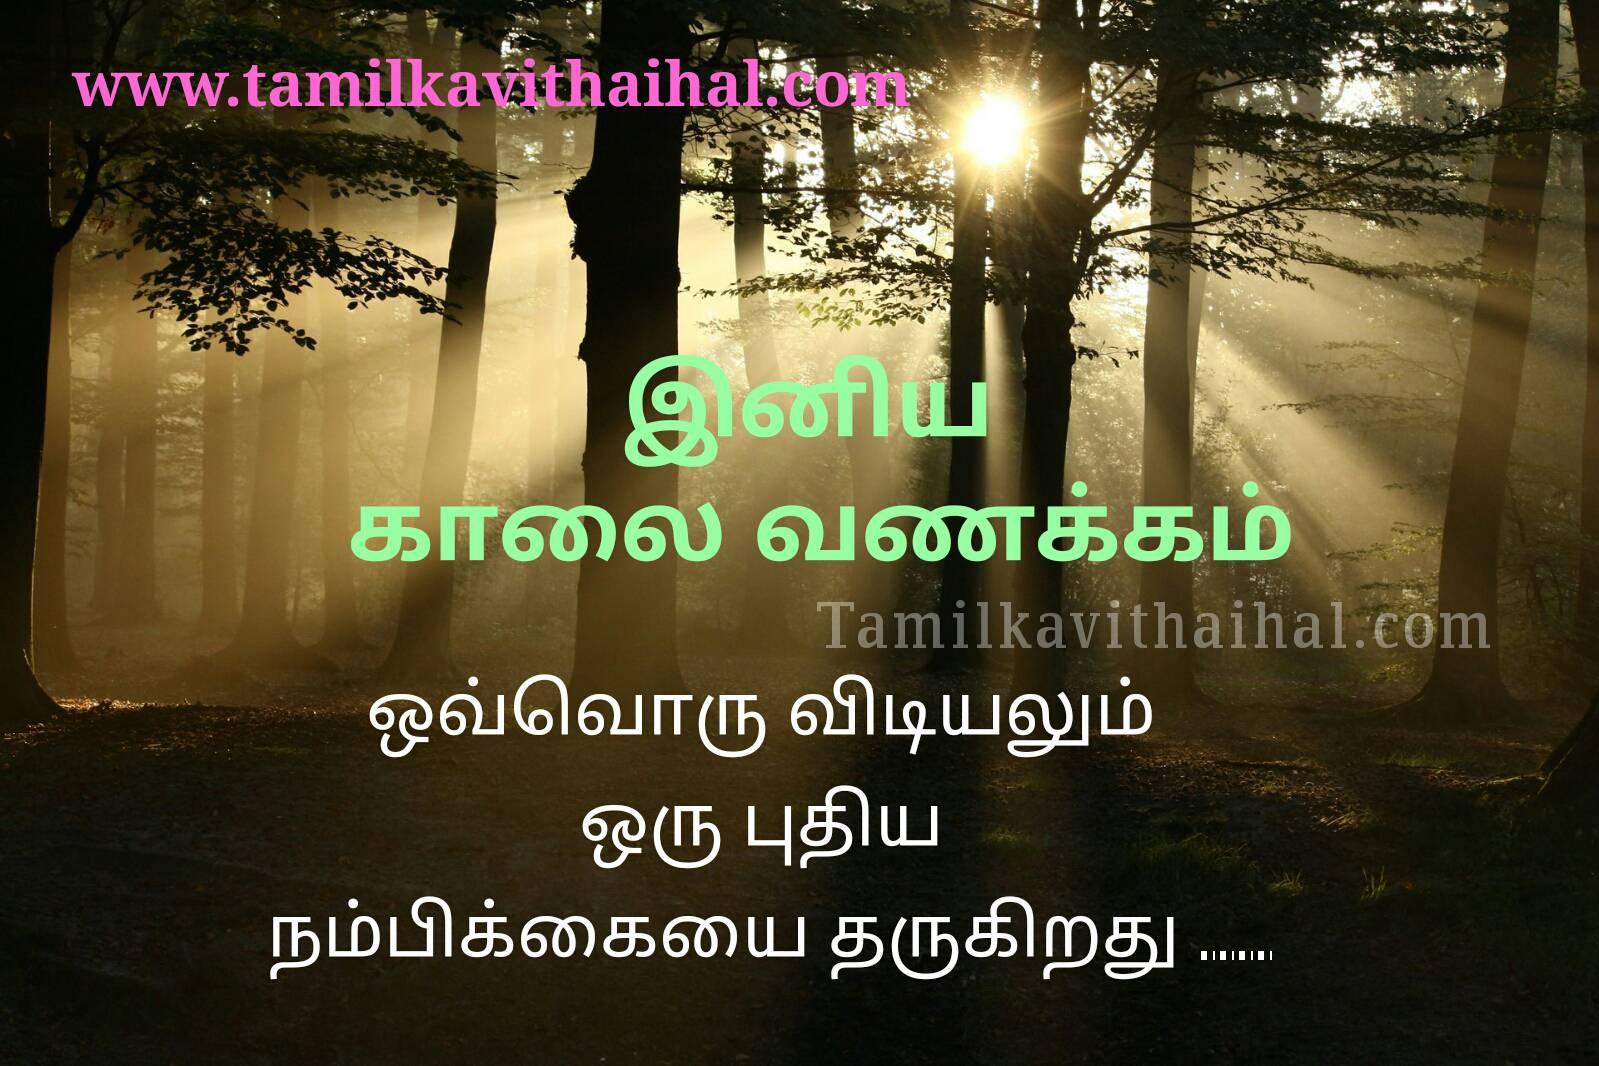 Fresh kalai vanakkam pictures kavithai in tamil good mrg sms whatsapp dp status update download